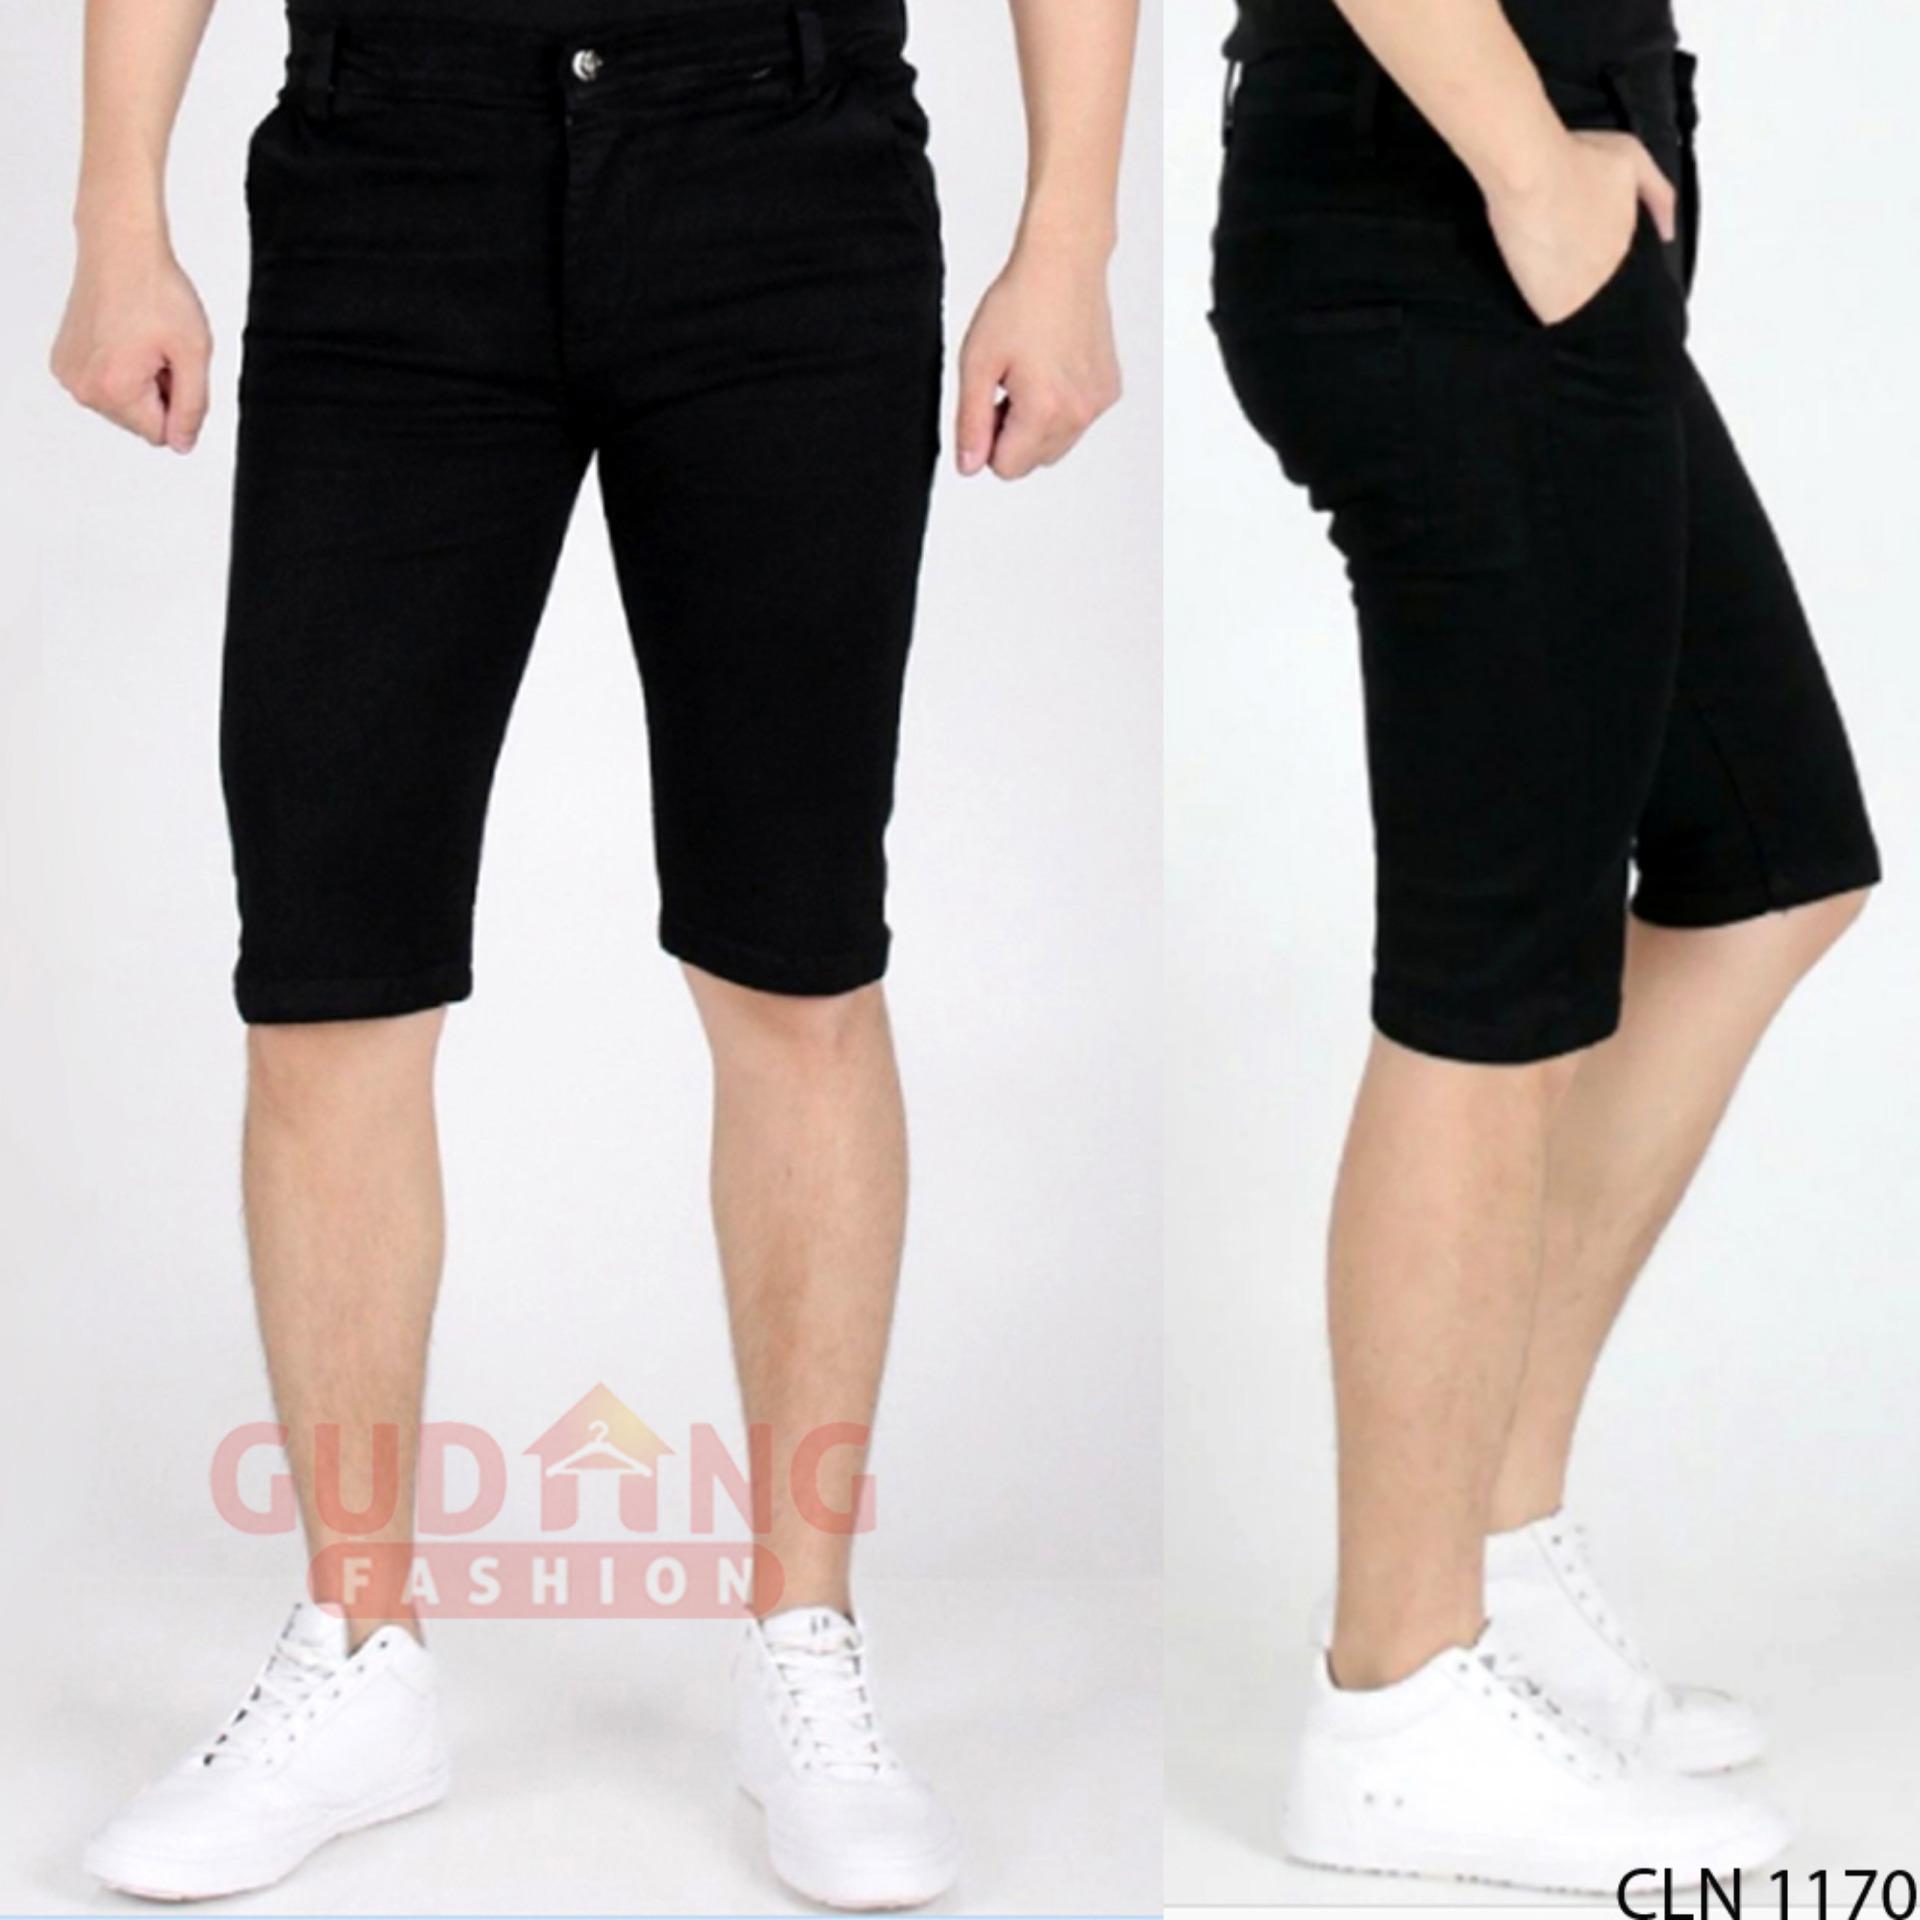 Gudang Fashion Model Celana Pendek Pria Multi Colour Daftar Harga Distro Polyester Cln 736 Jeans Terbaru